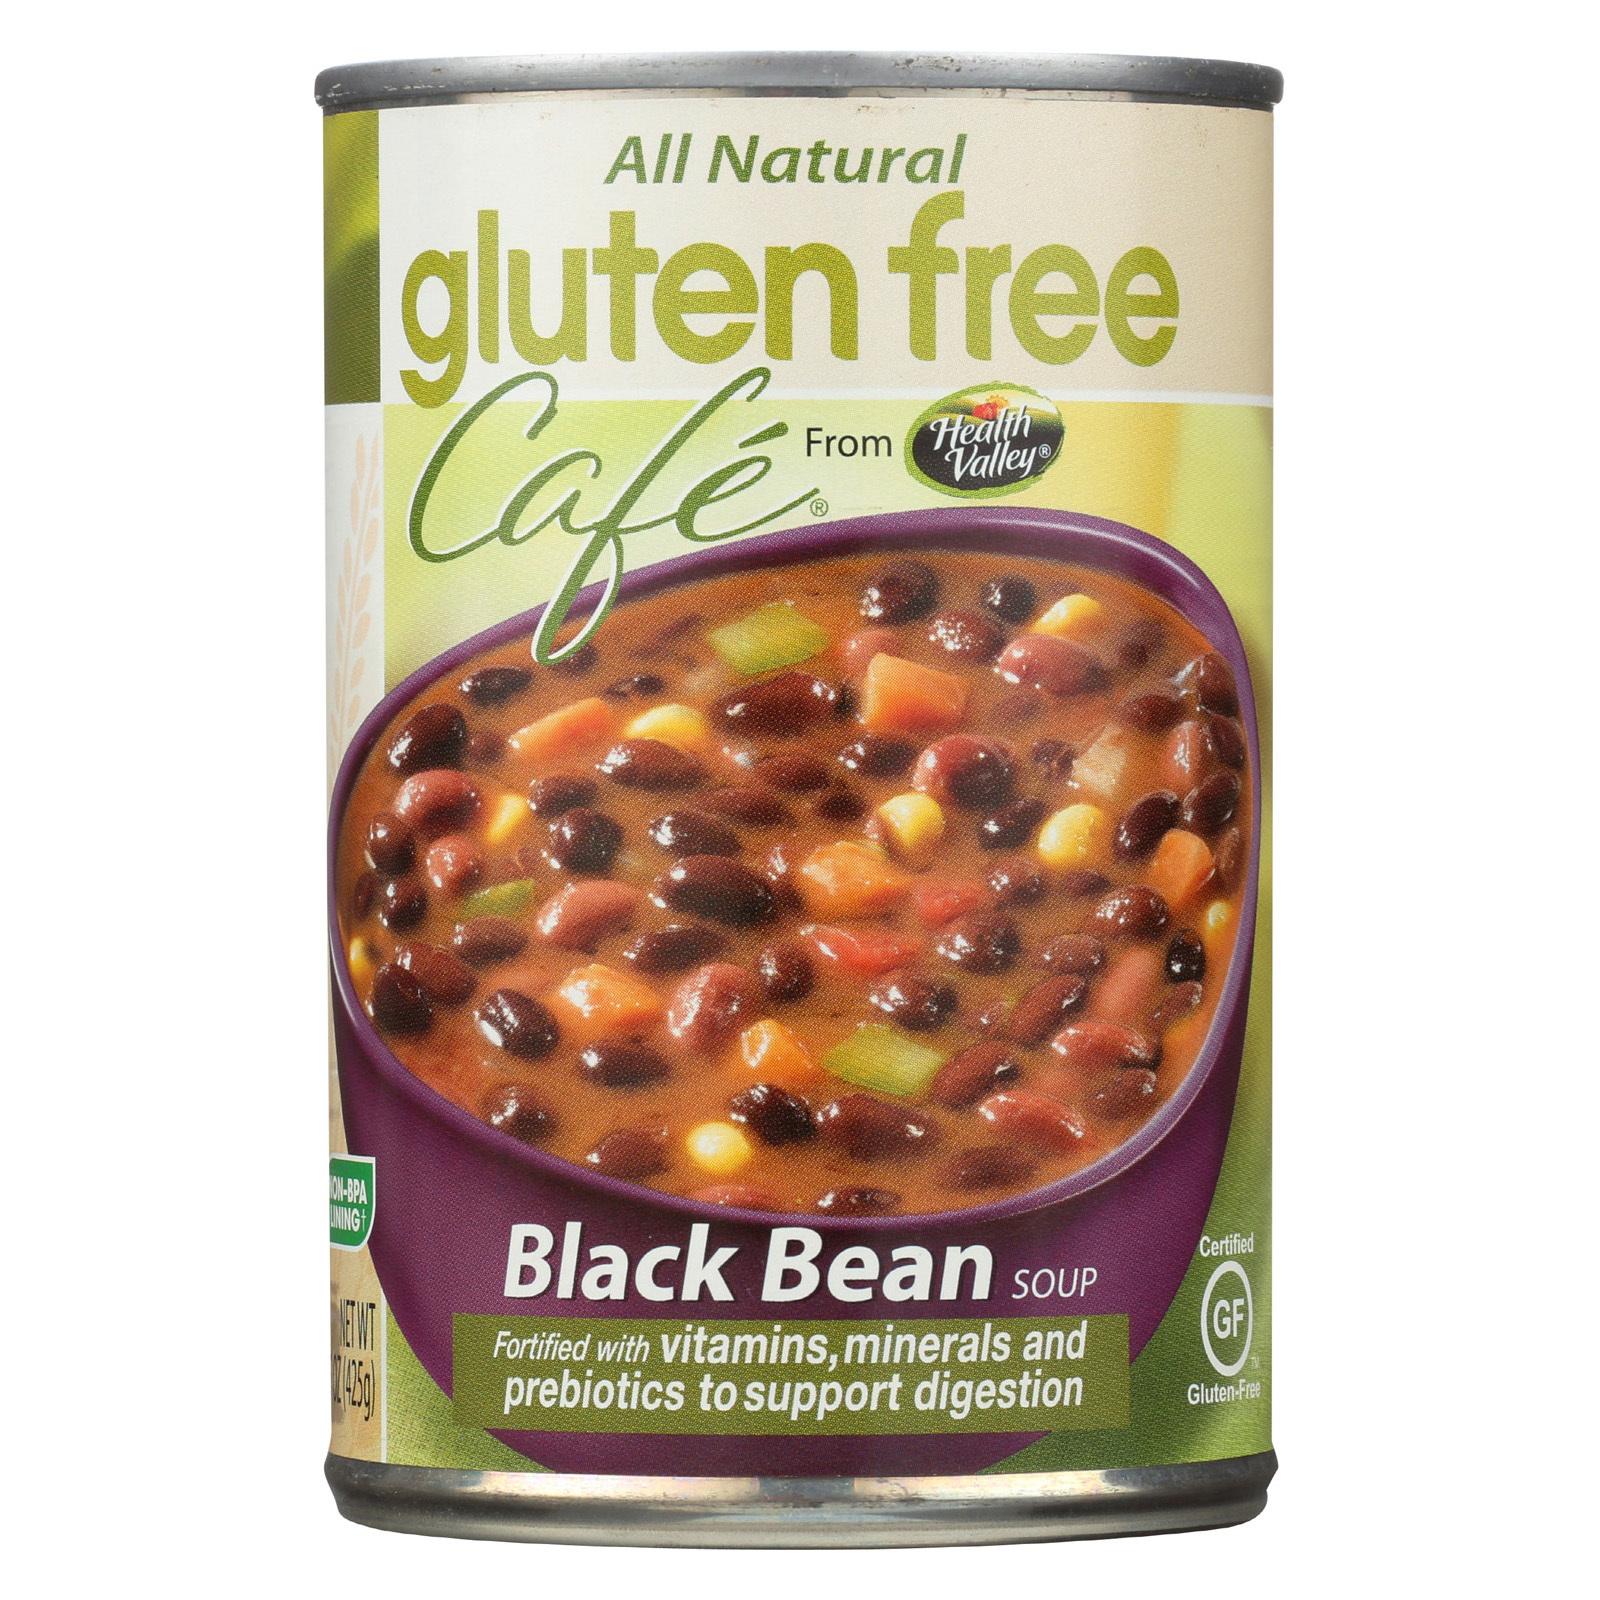 Gluten Free Cafe Soup - Black Bean - Case of 12 - 15 oz